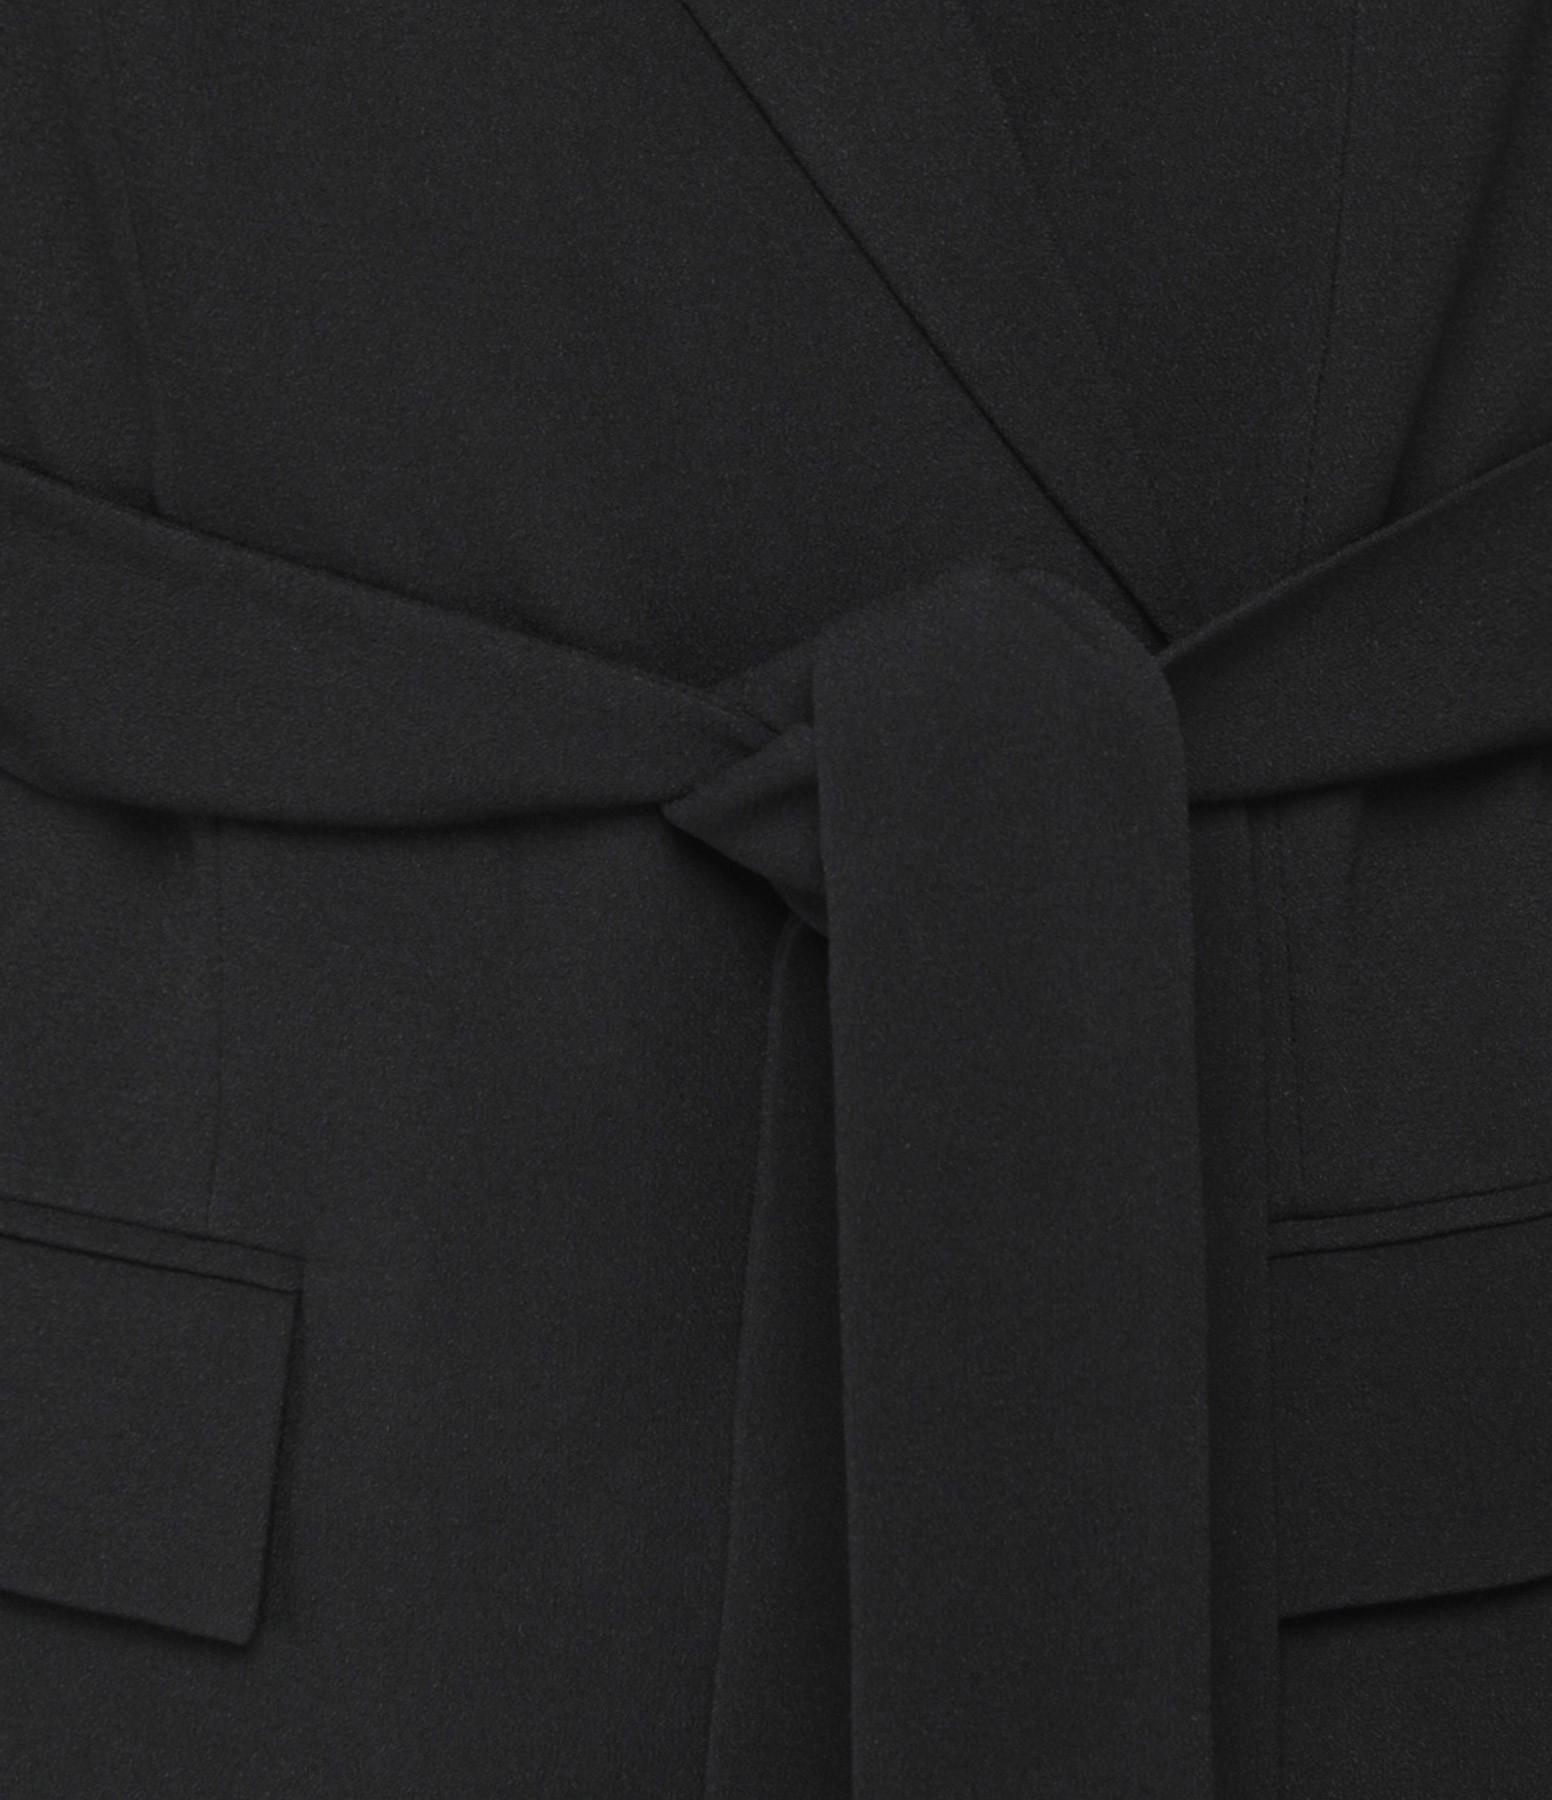 THEORY - Veste Blazer Ceinturé Noir